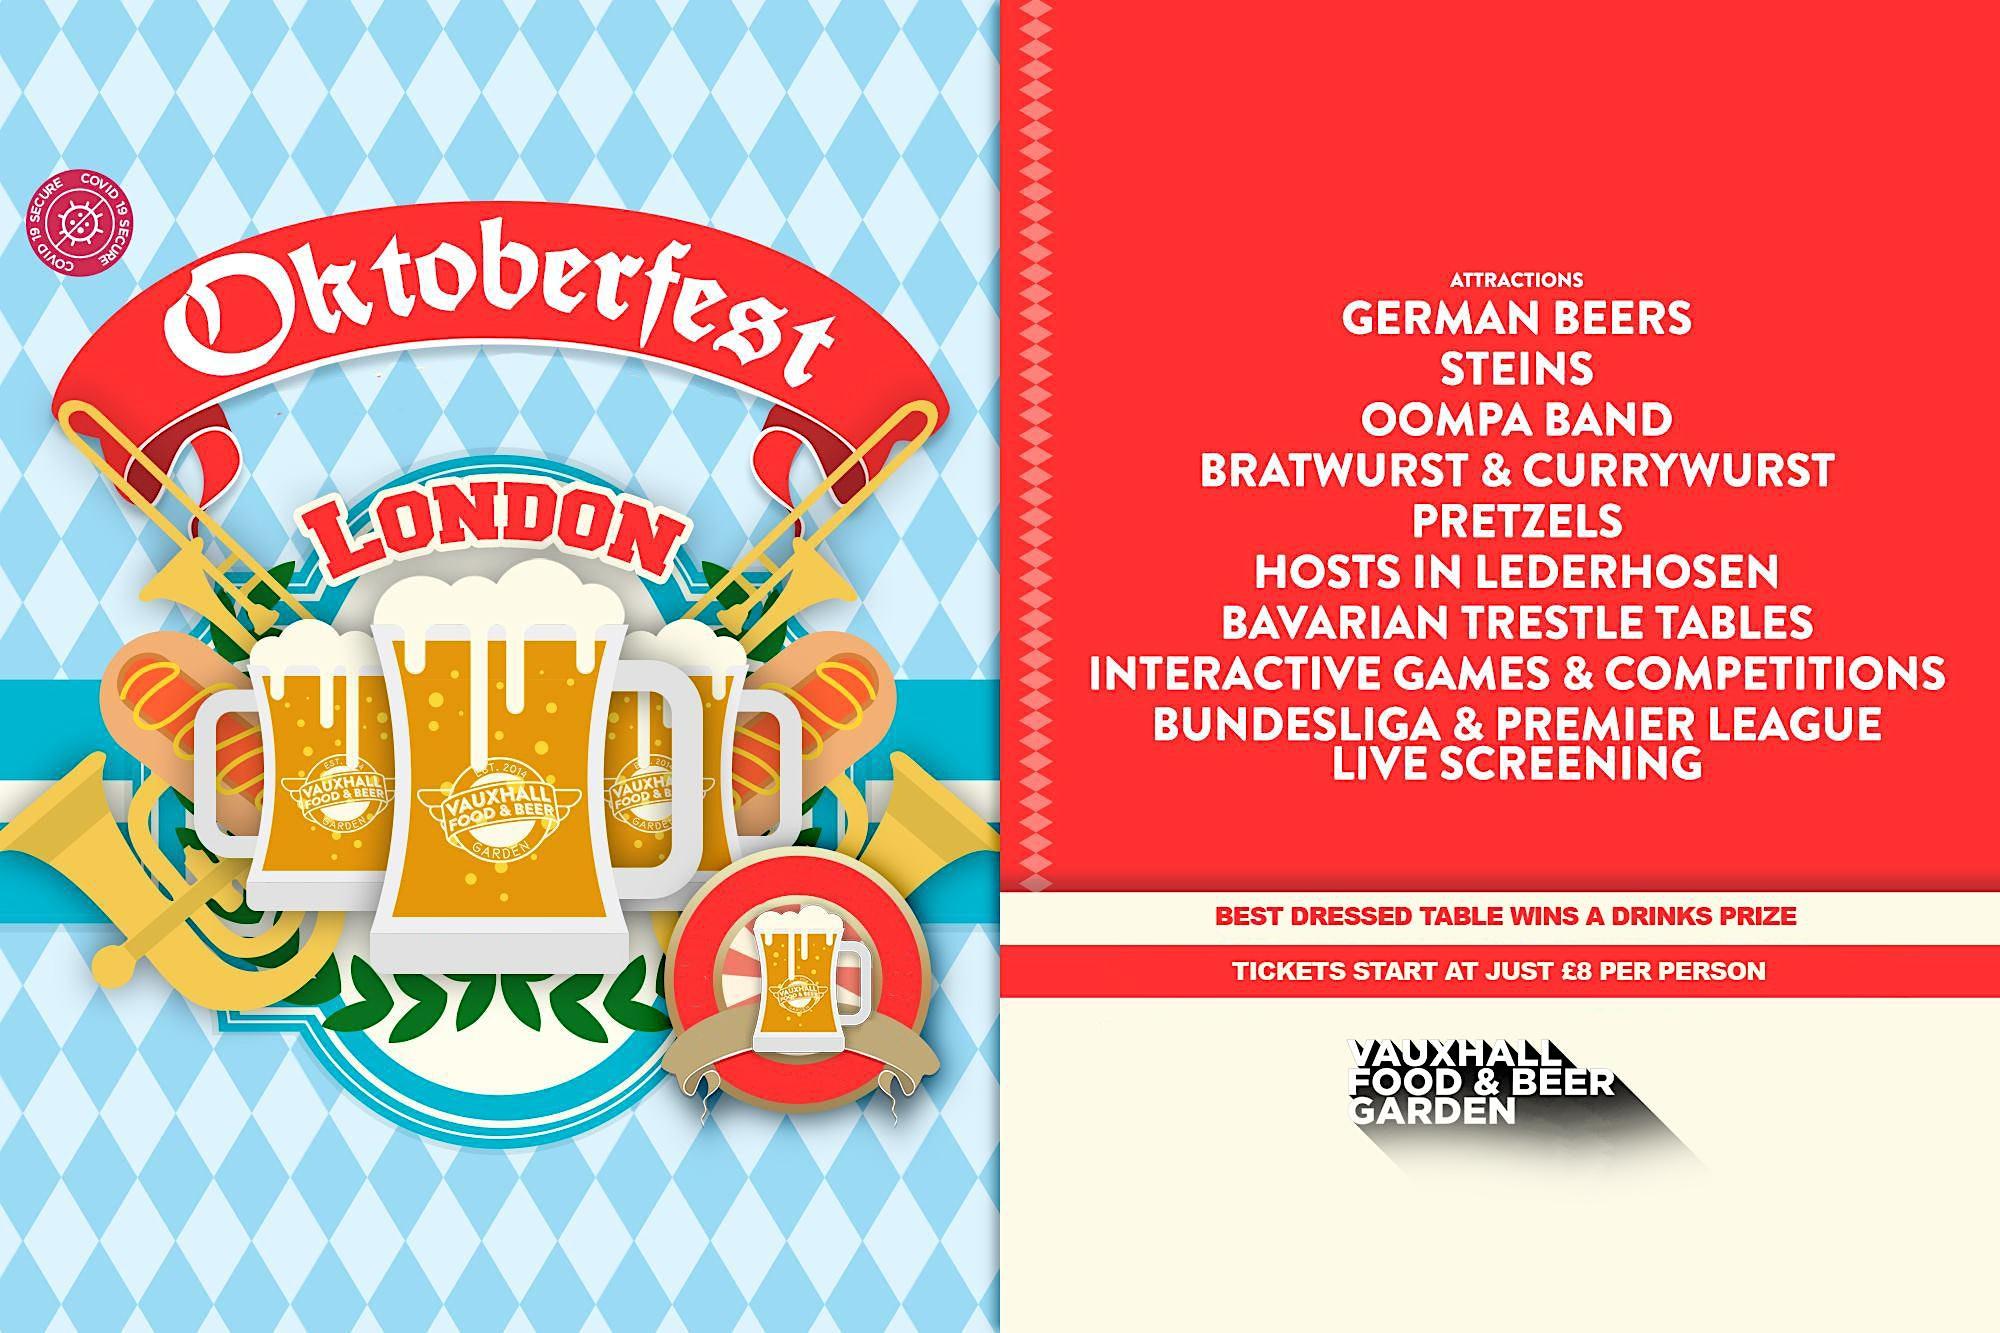 Oktoberfest London, 22 October | Event in London | AllEvents.in